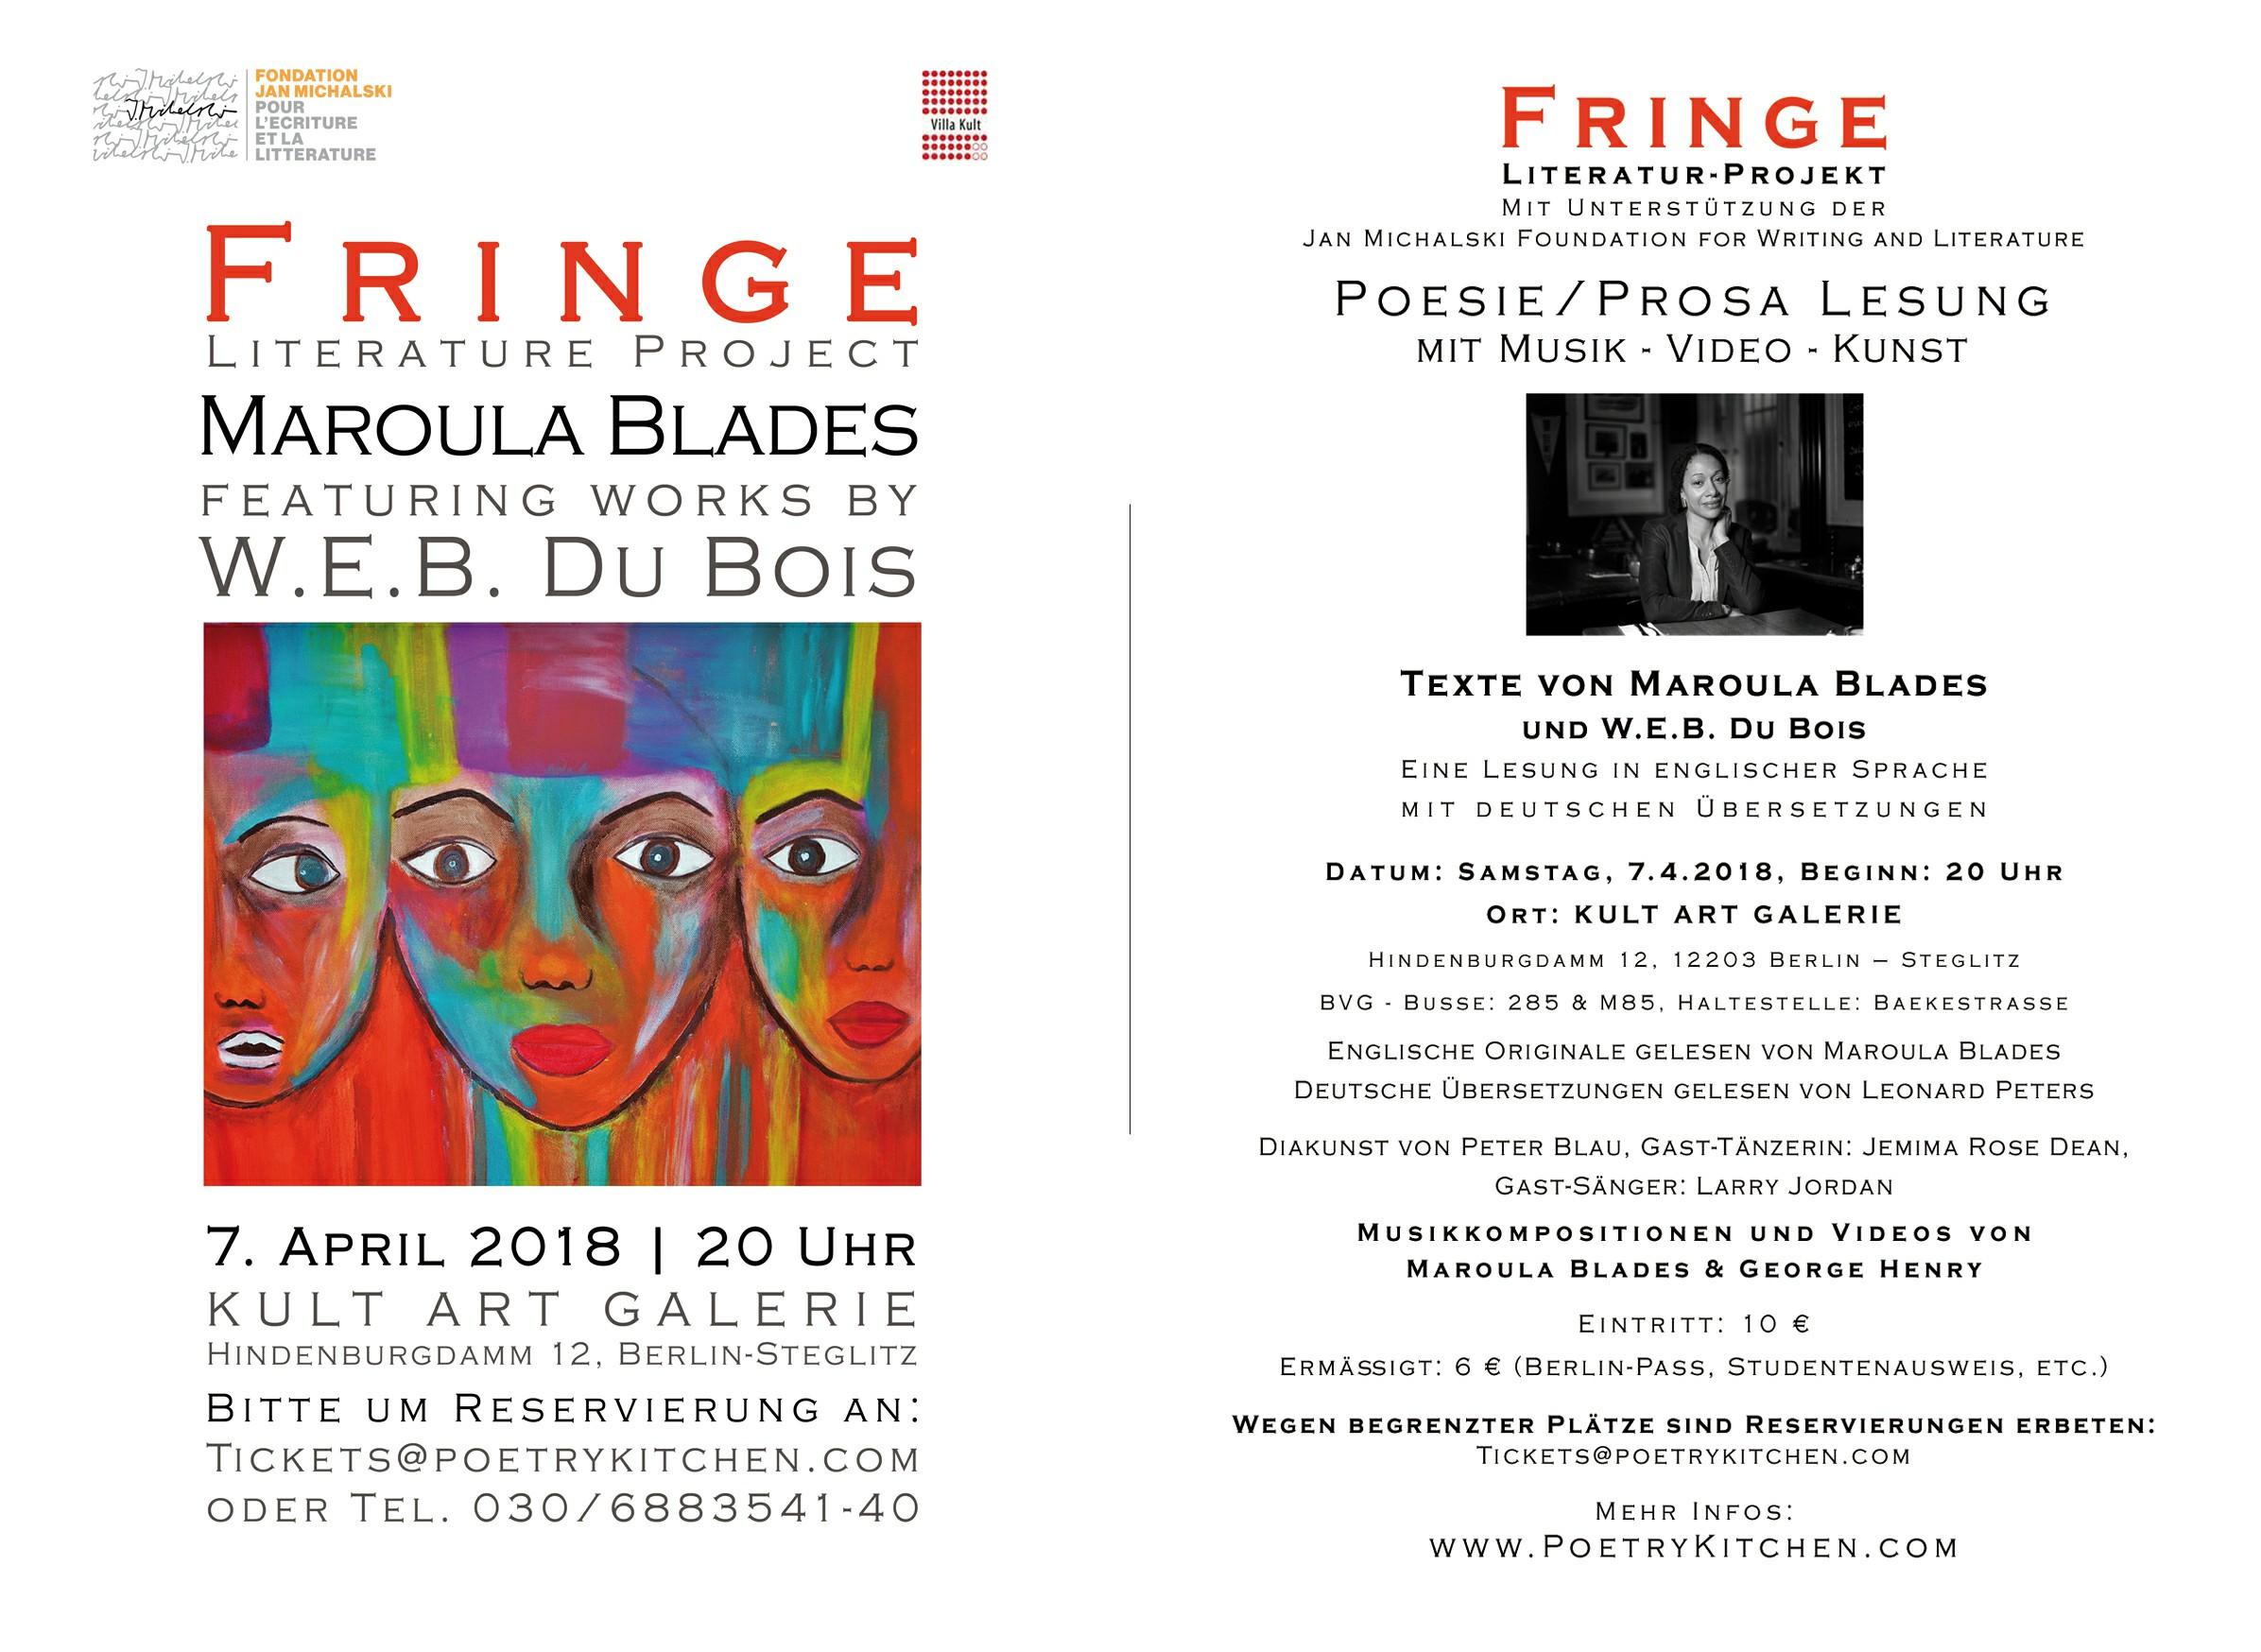 email flyer - Maroula Blades - FRINGE